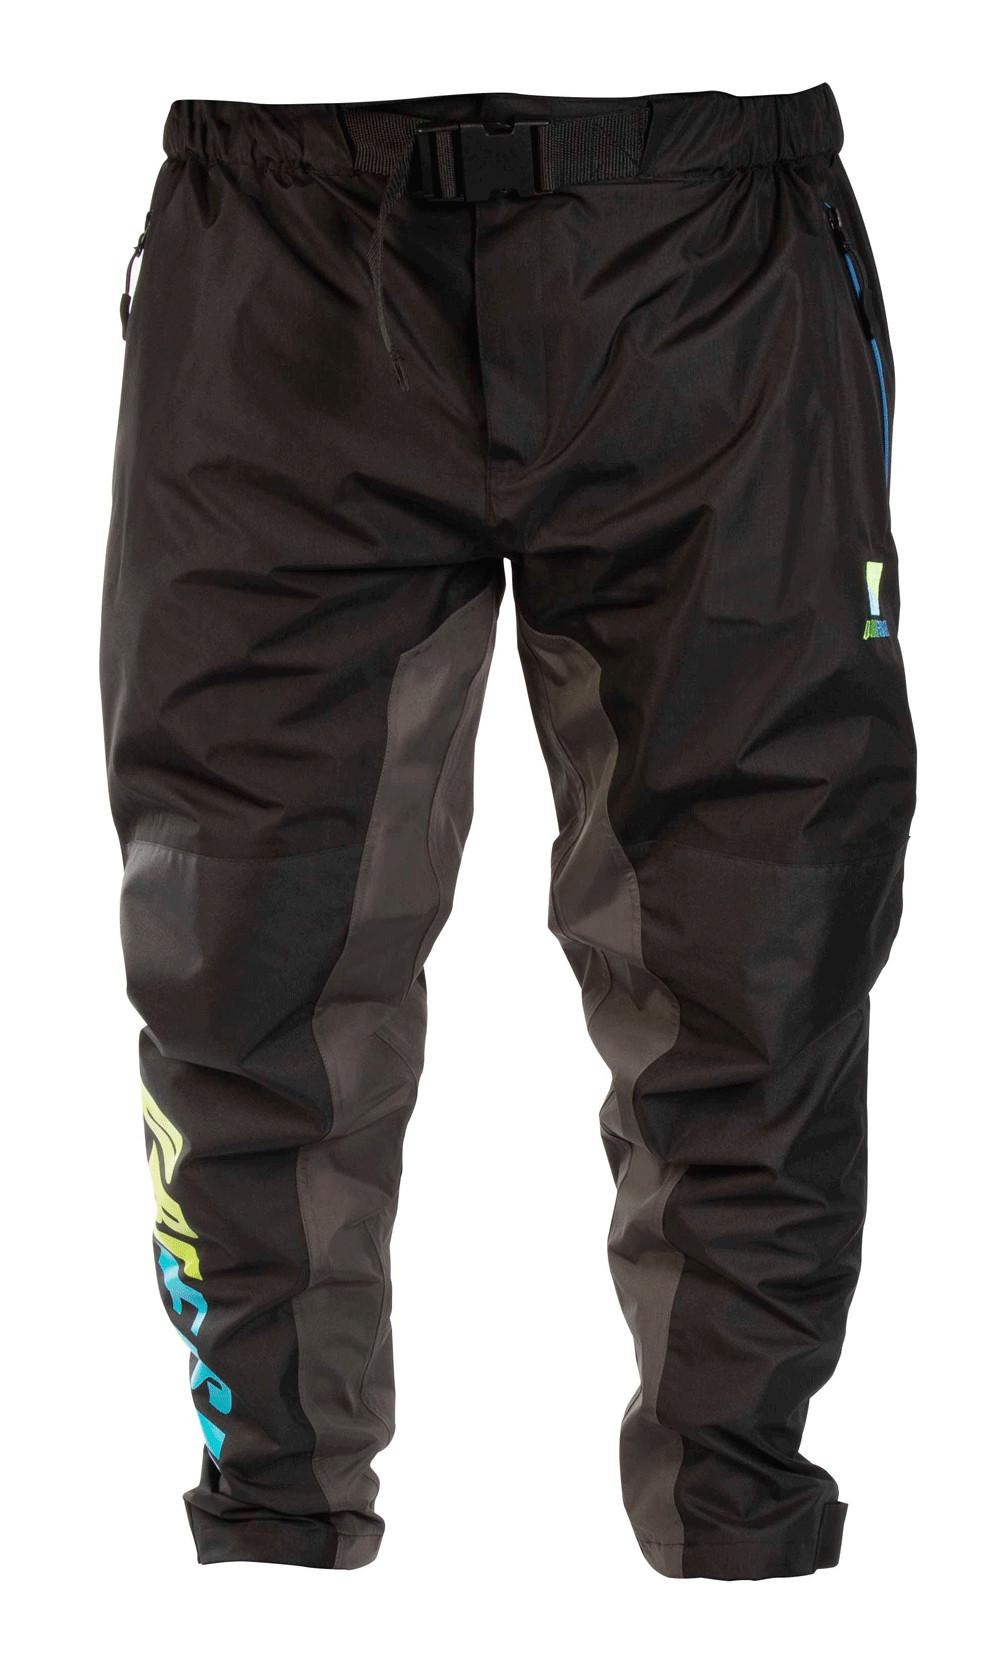 All Sizes Avid Carp Cargo Combat Trousers